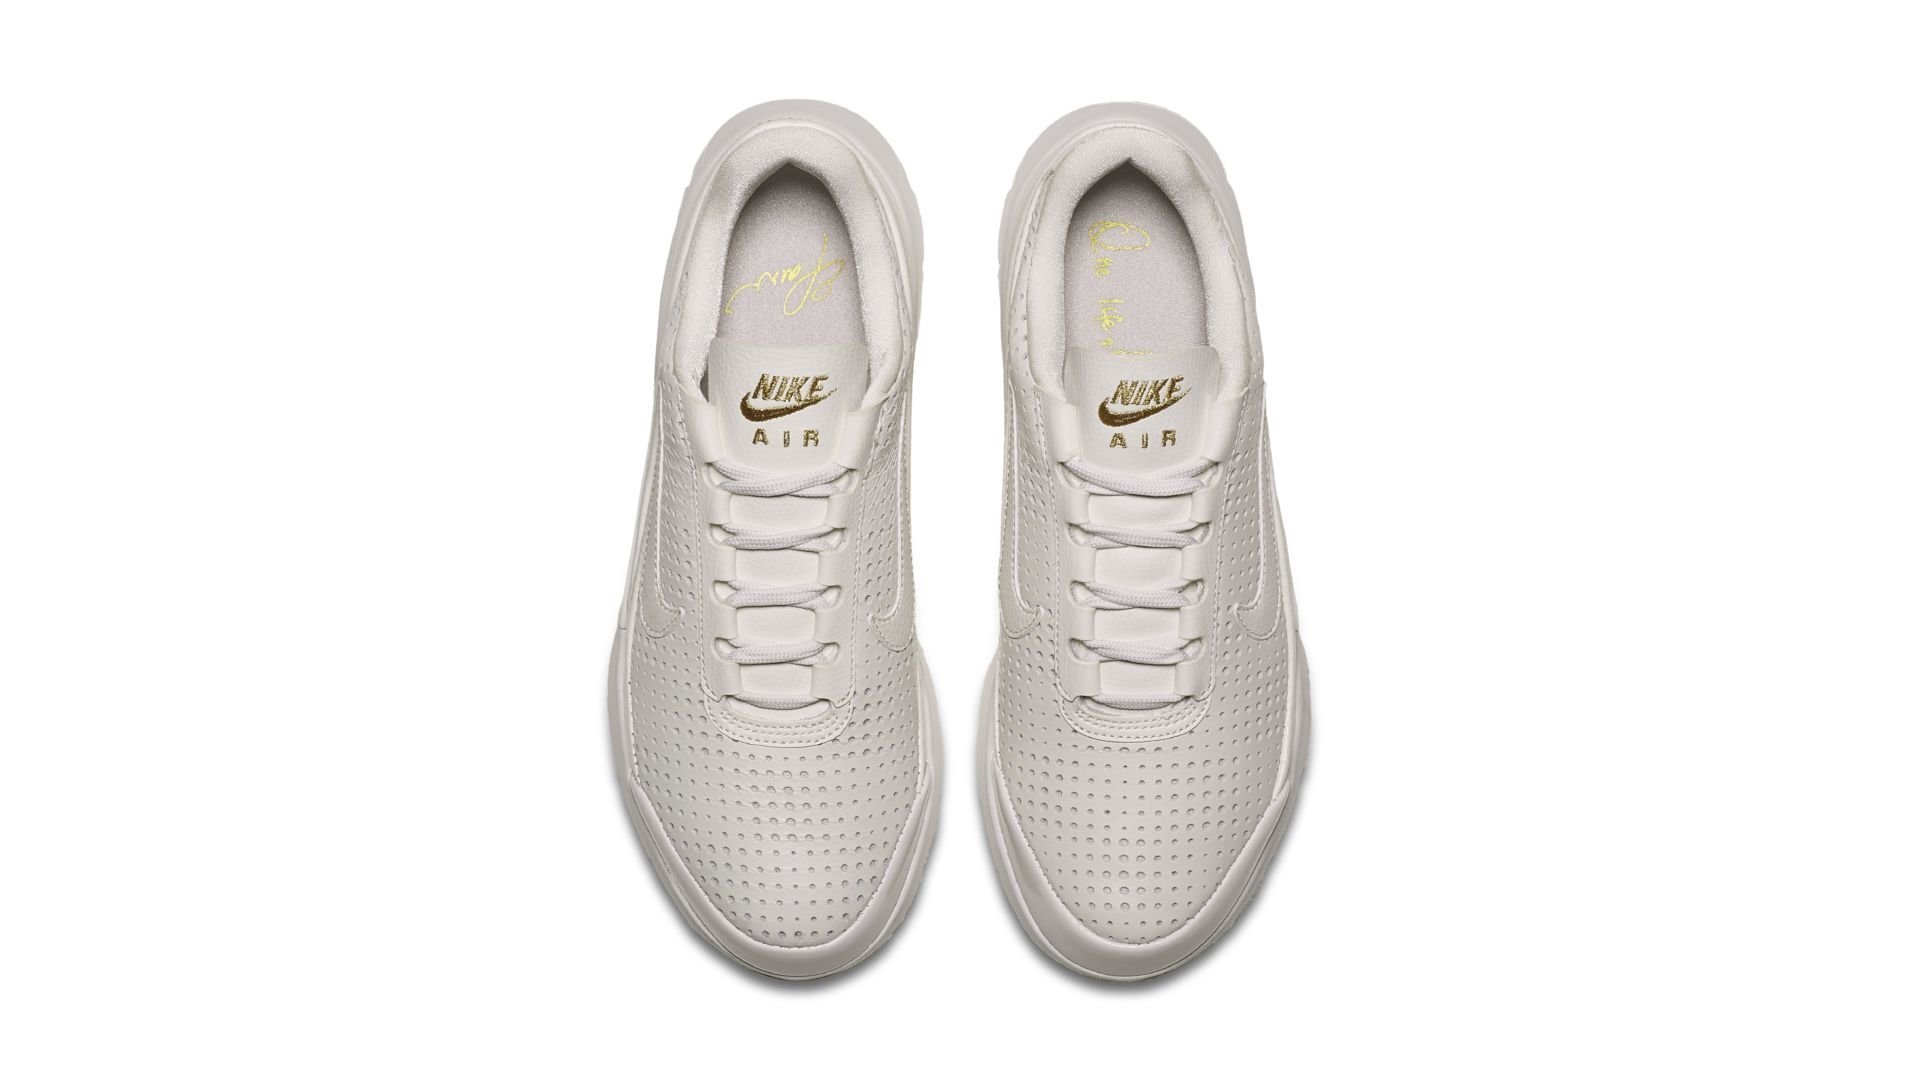 Nike Air Max Jewell Premium QS (896197-100)